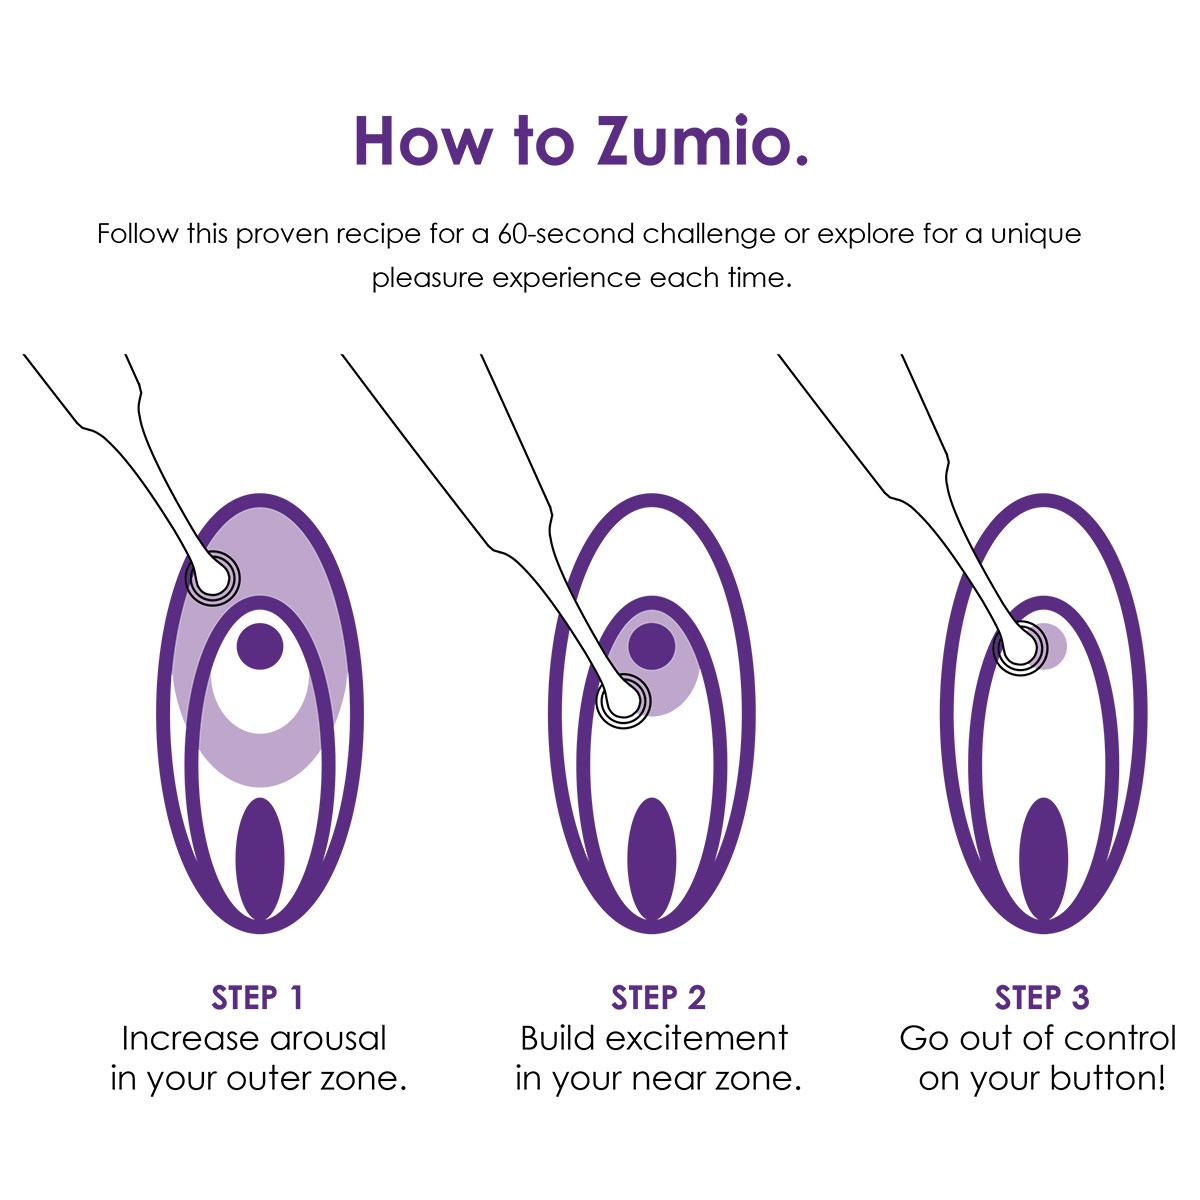 zumio-how-to-use-2.jpg